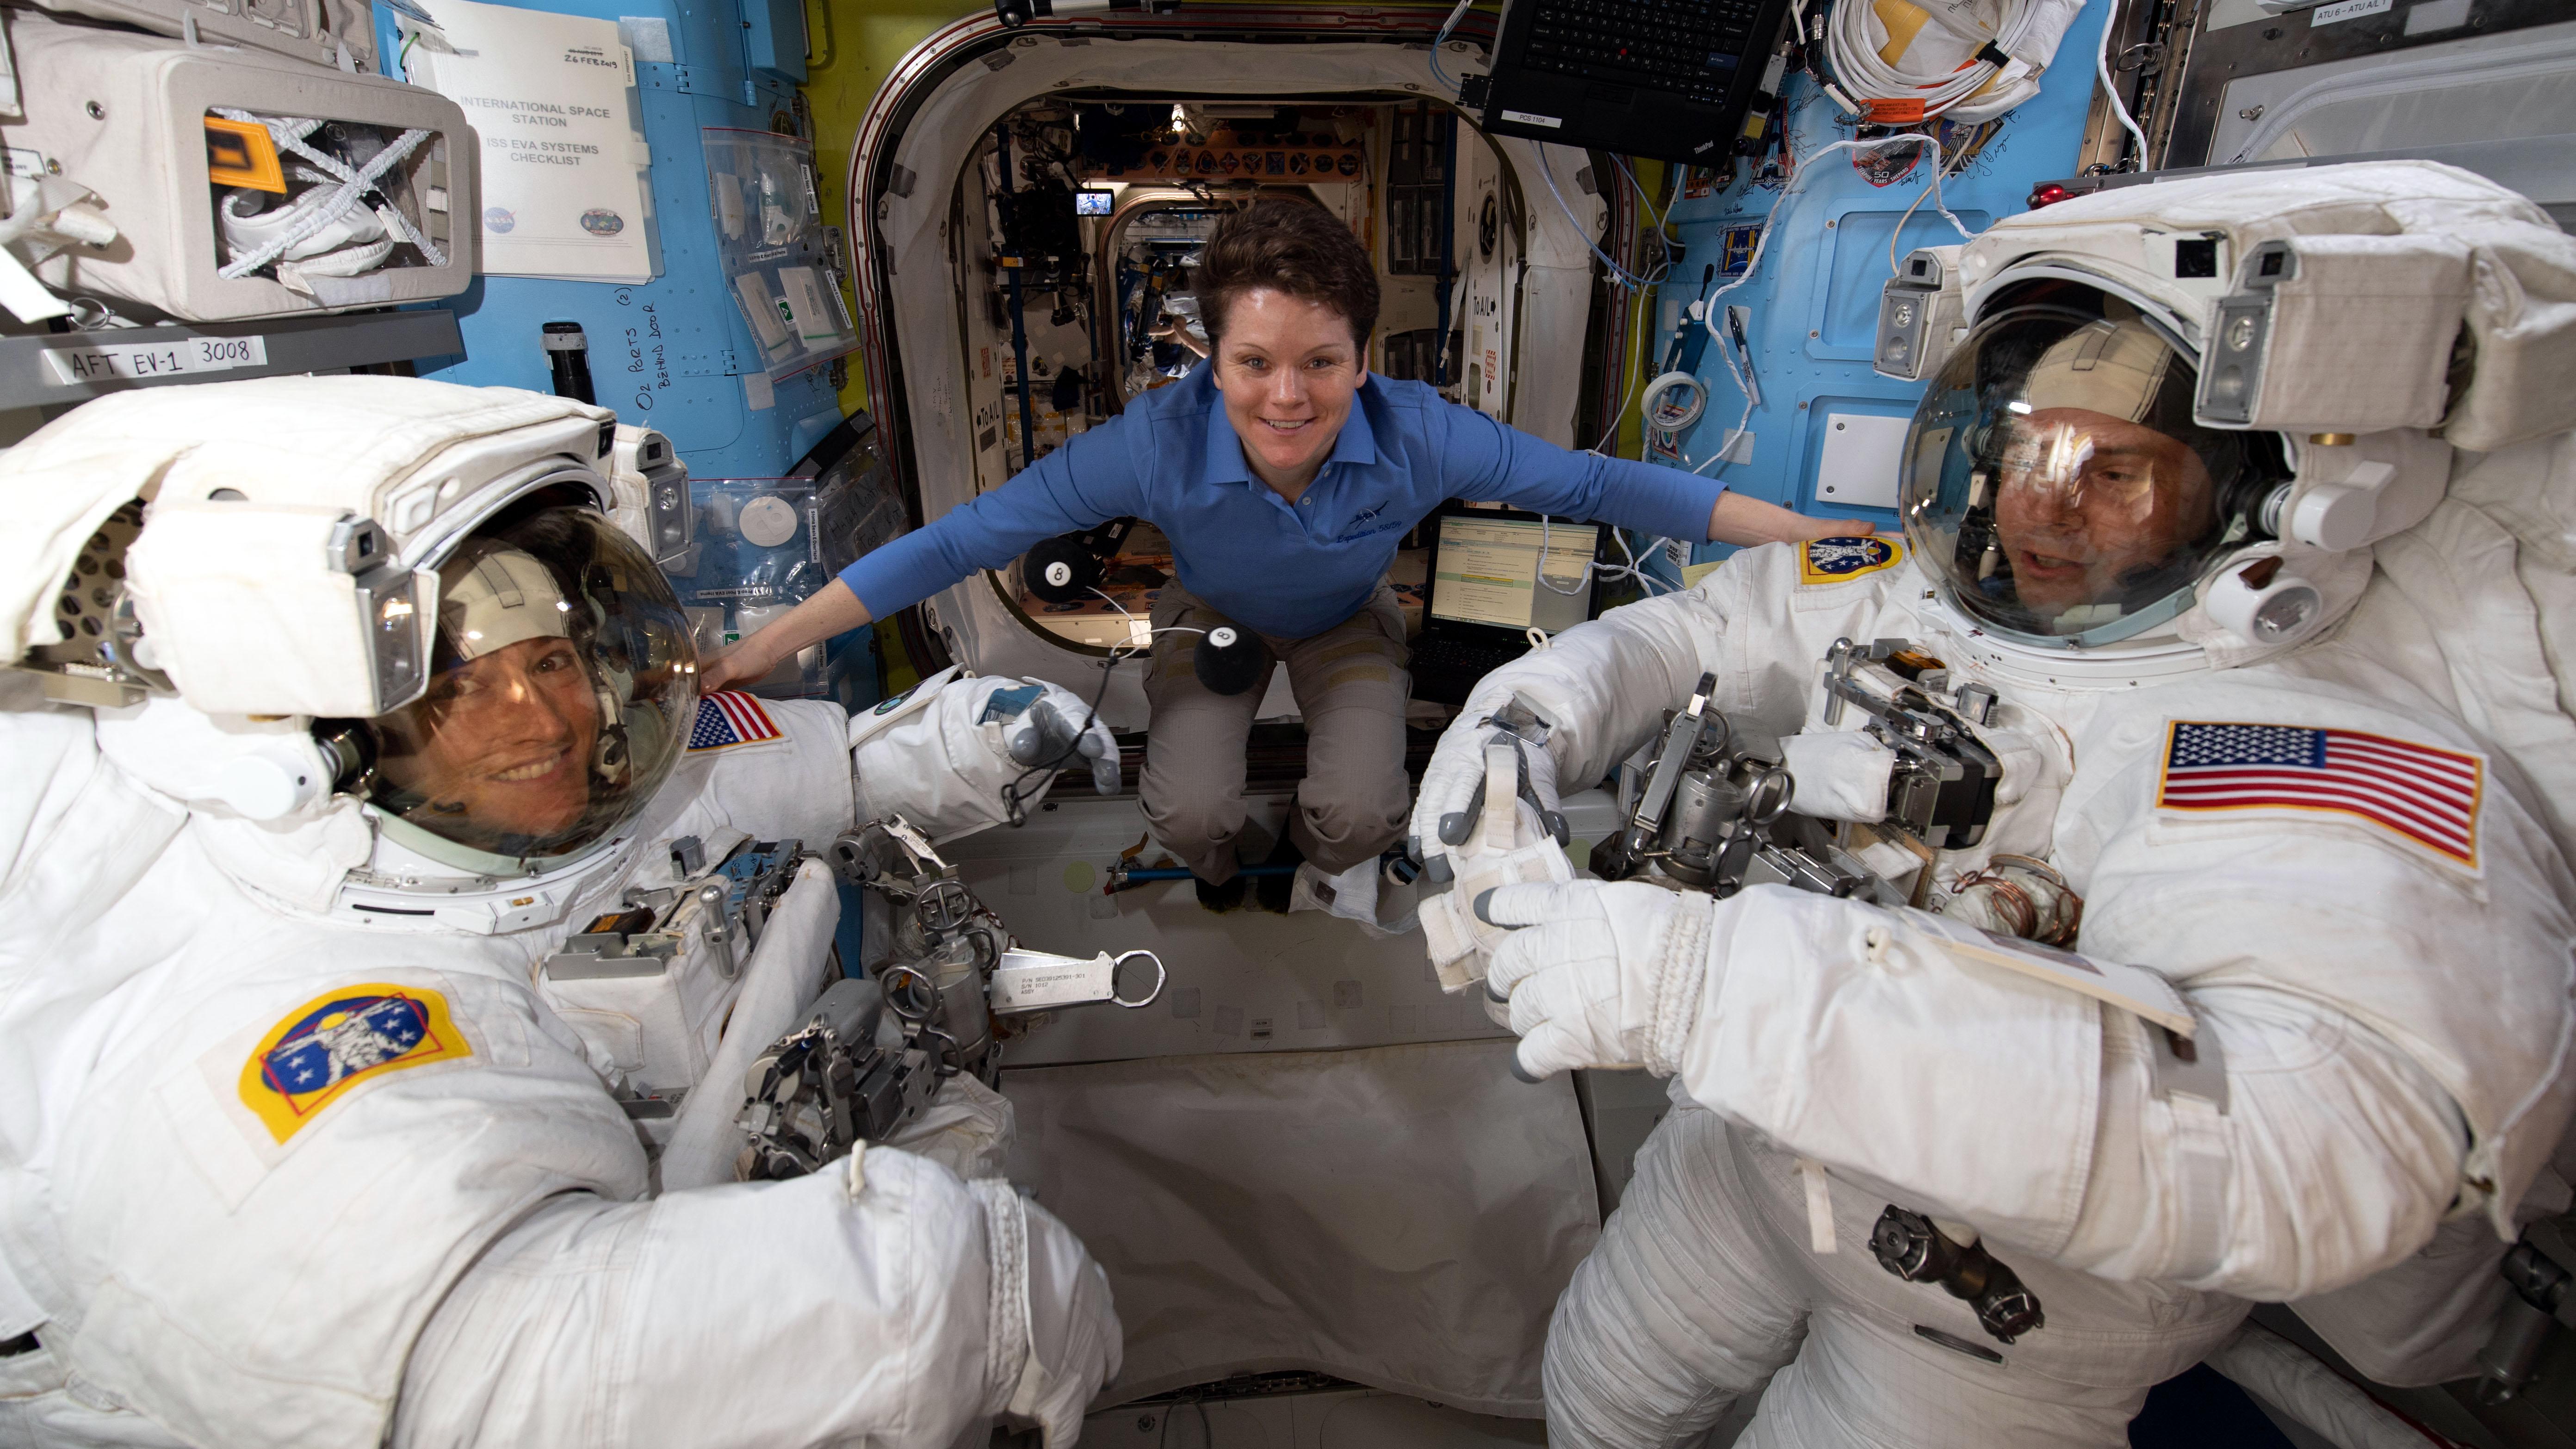 astronaut hates space - photo #48